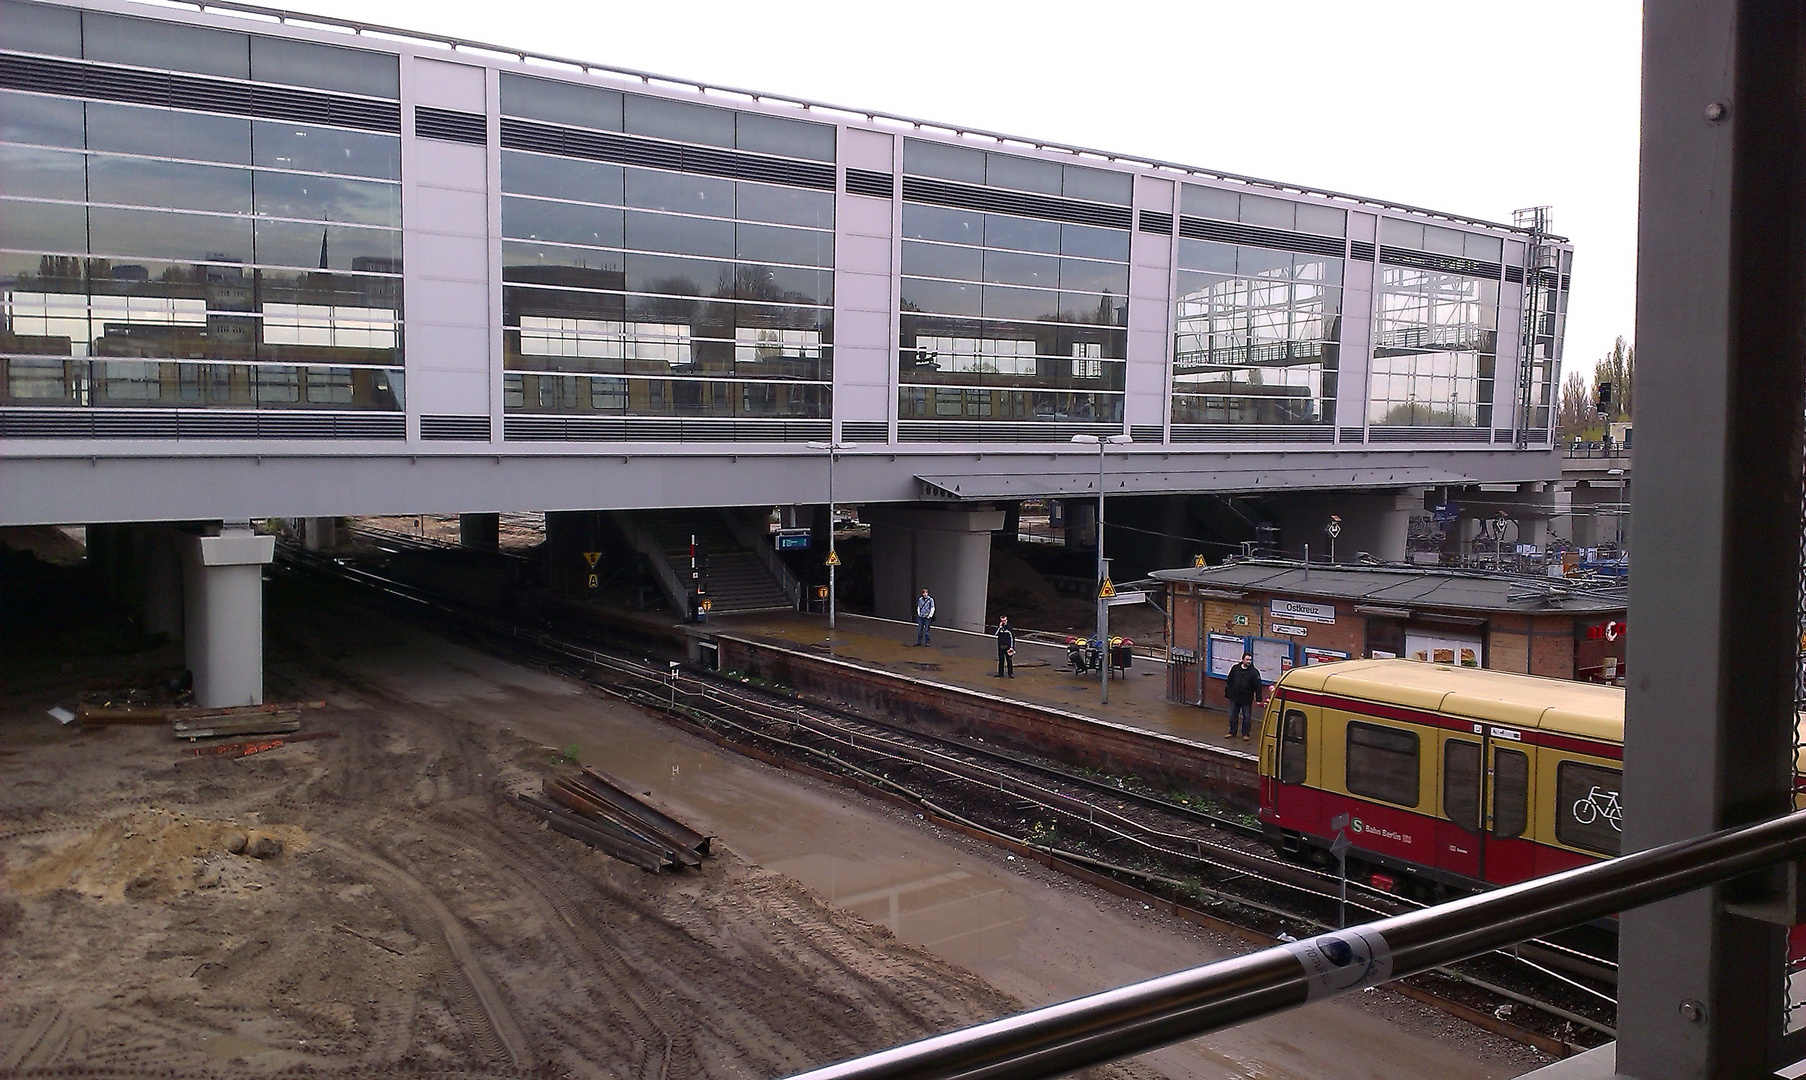 Baustelle S-Bahnhof Ostkreuz